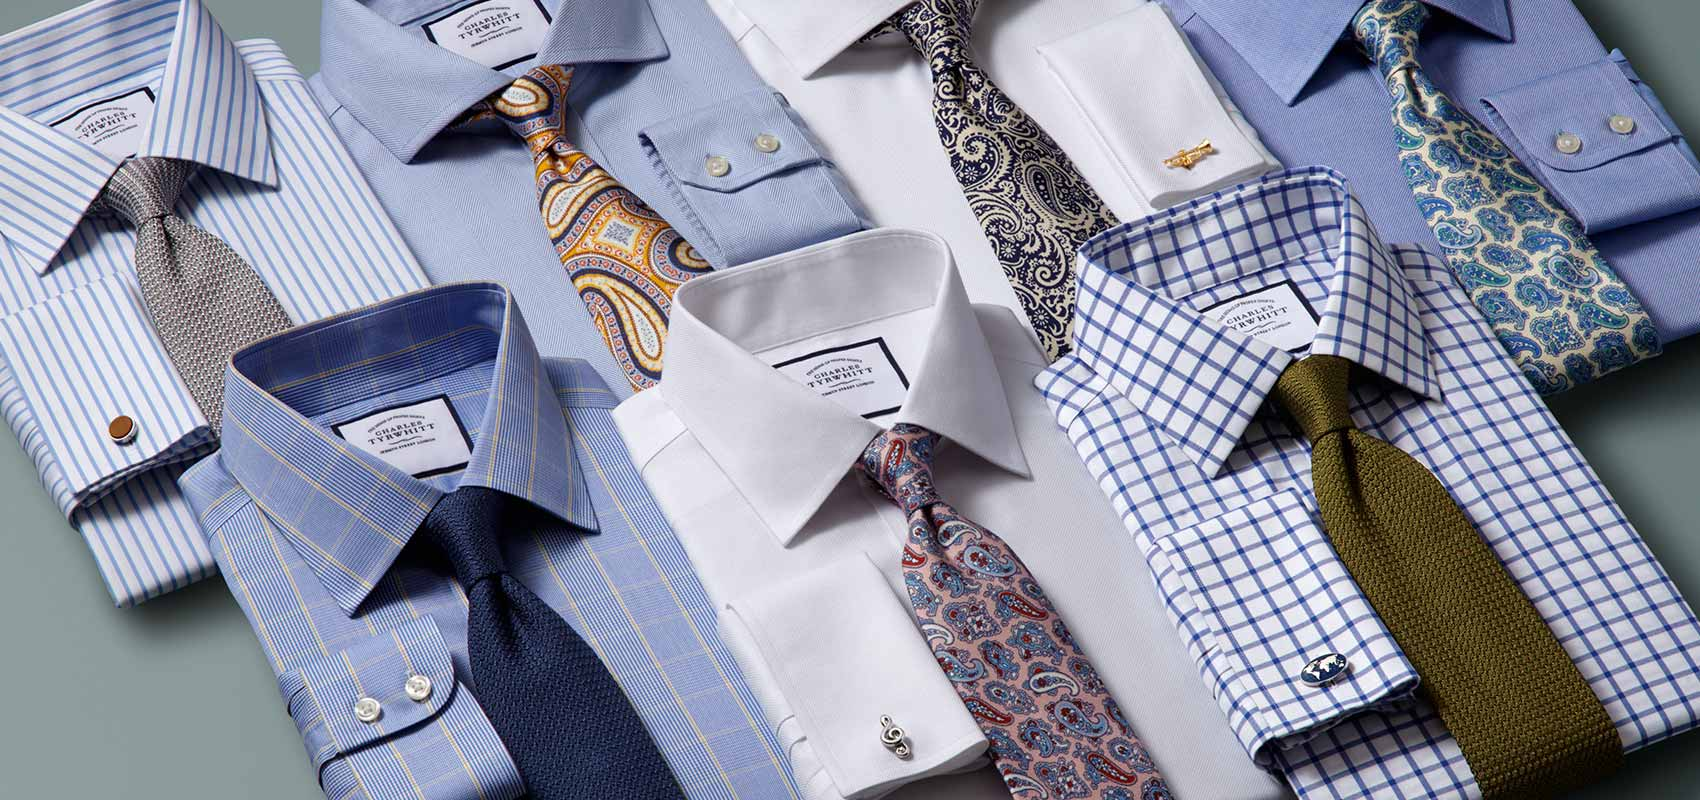 Non-iron white and blue shirts